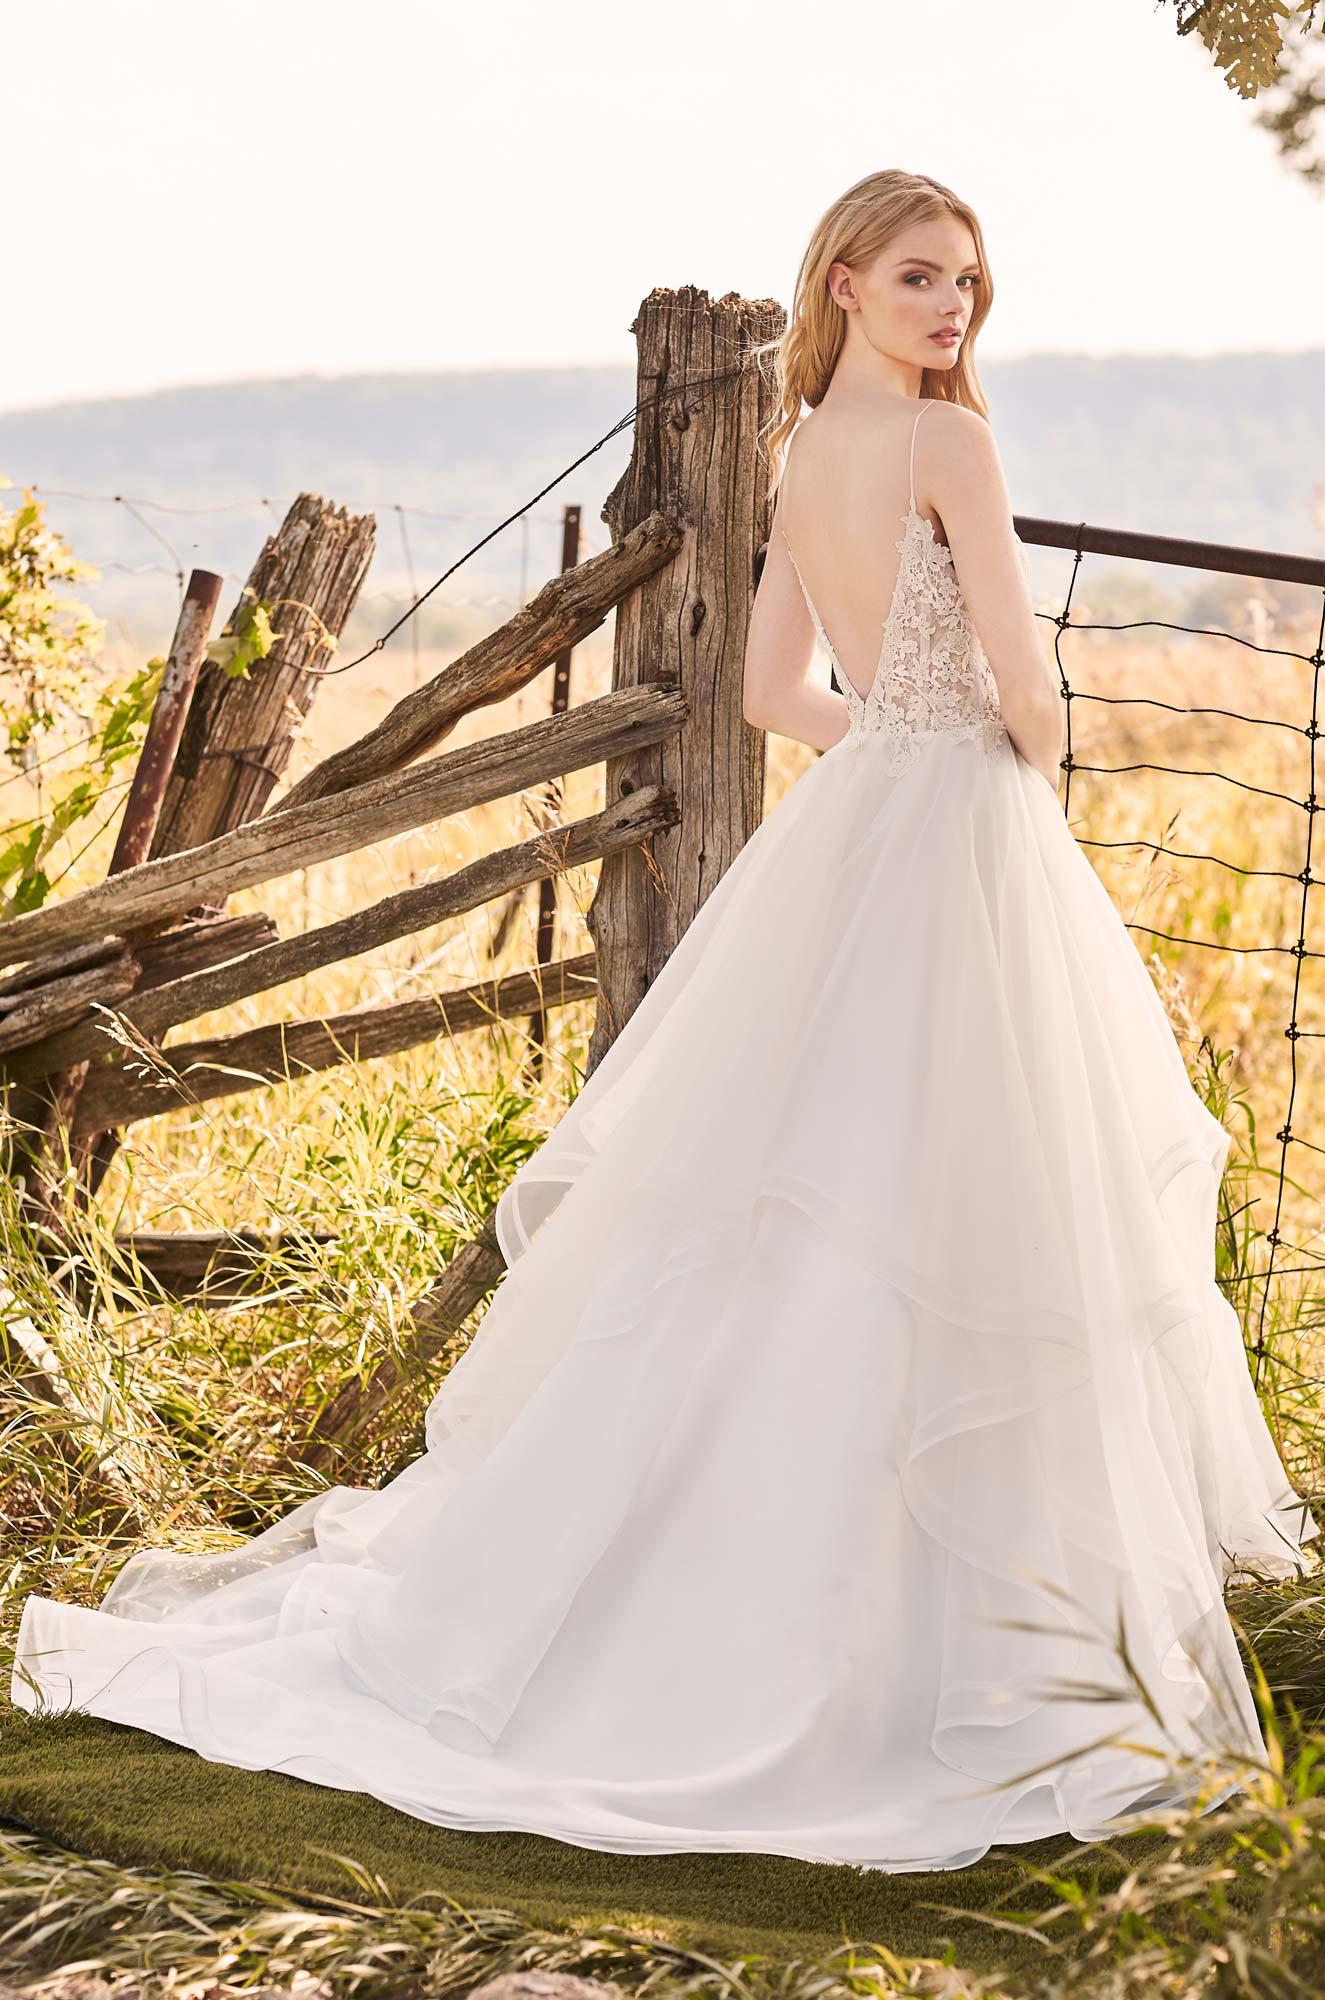 Fairytale Organza Skirt Wedding Dress - Style #2287 | Mikaella Bridal